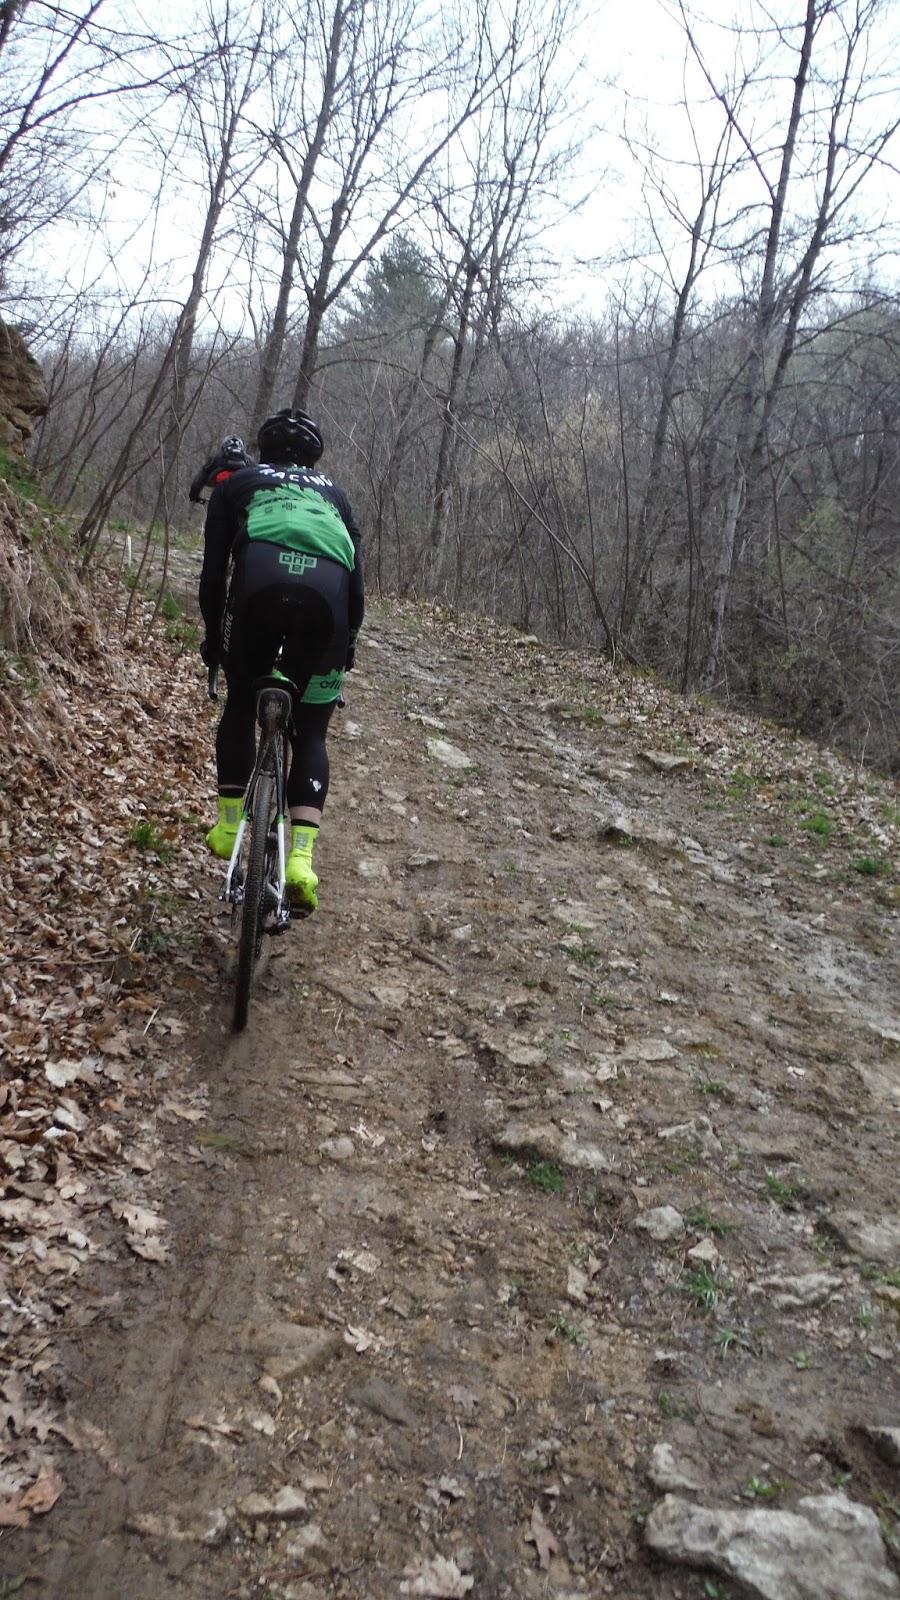 Fun climb in some muddy dirt. I like the off-road stuff the best.